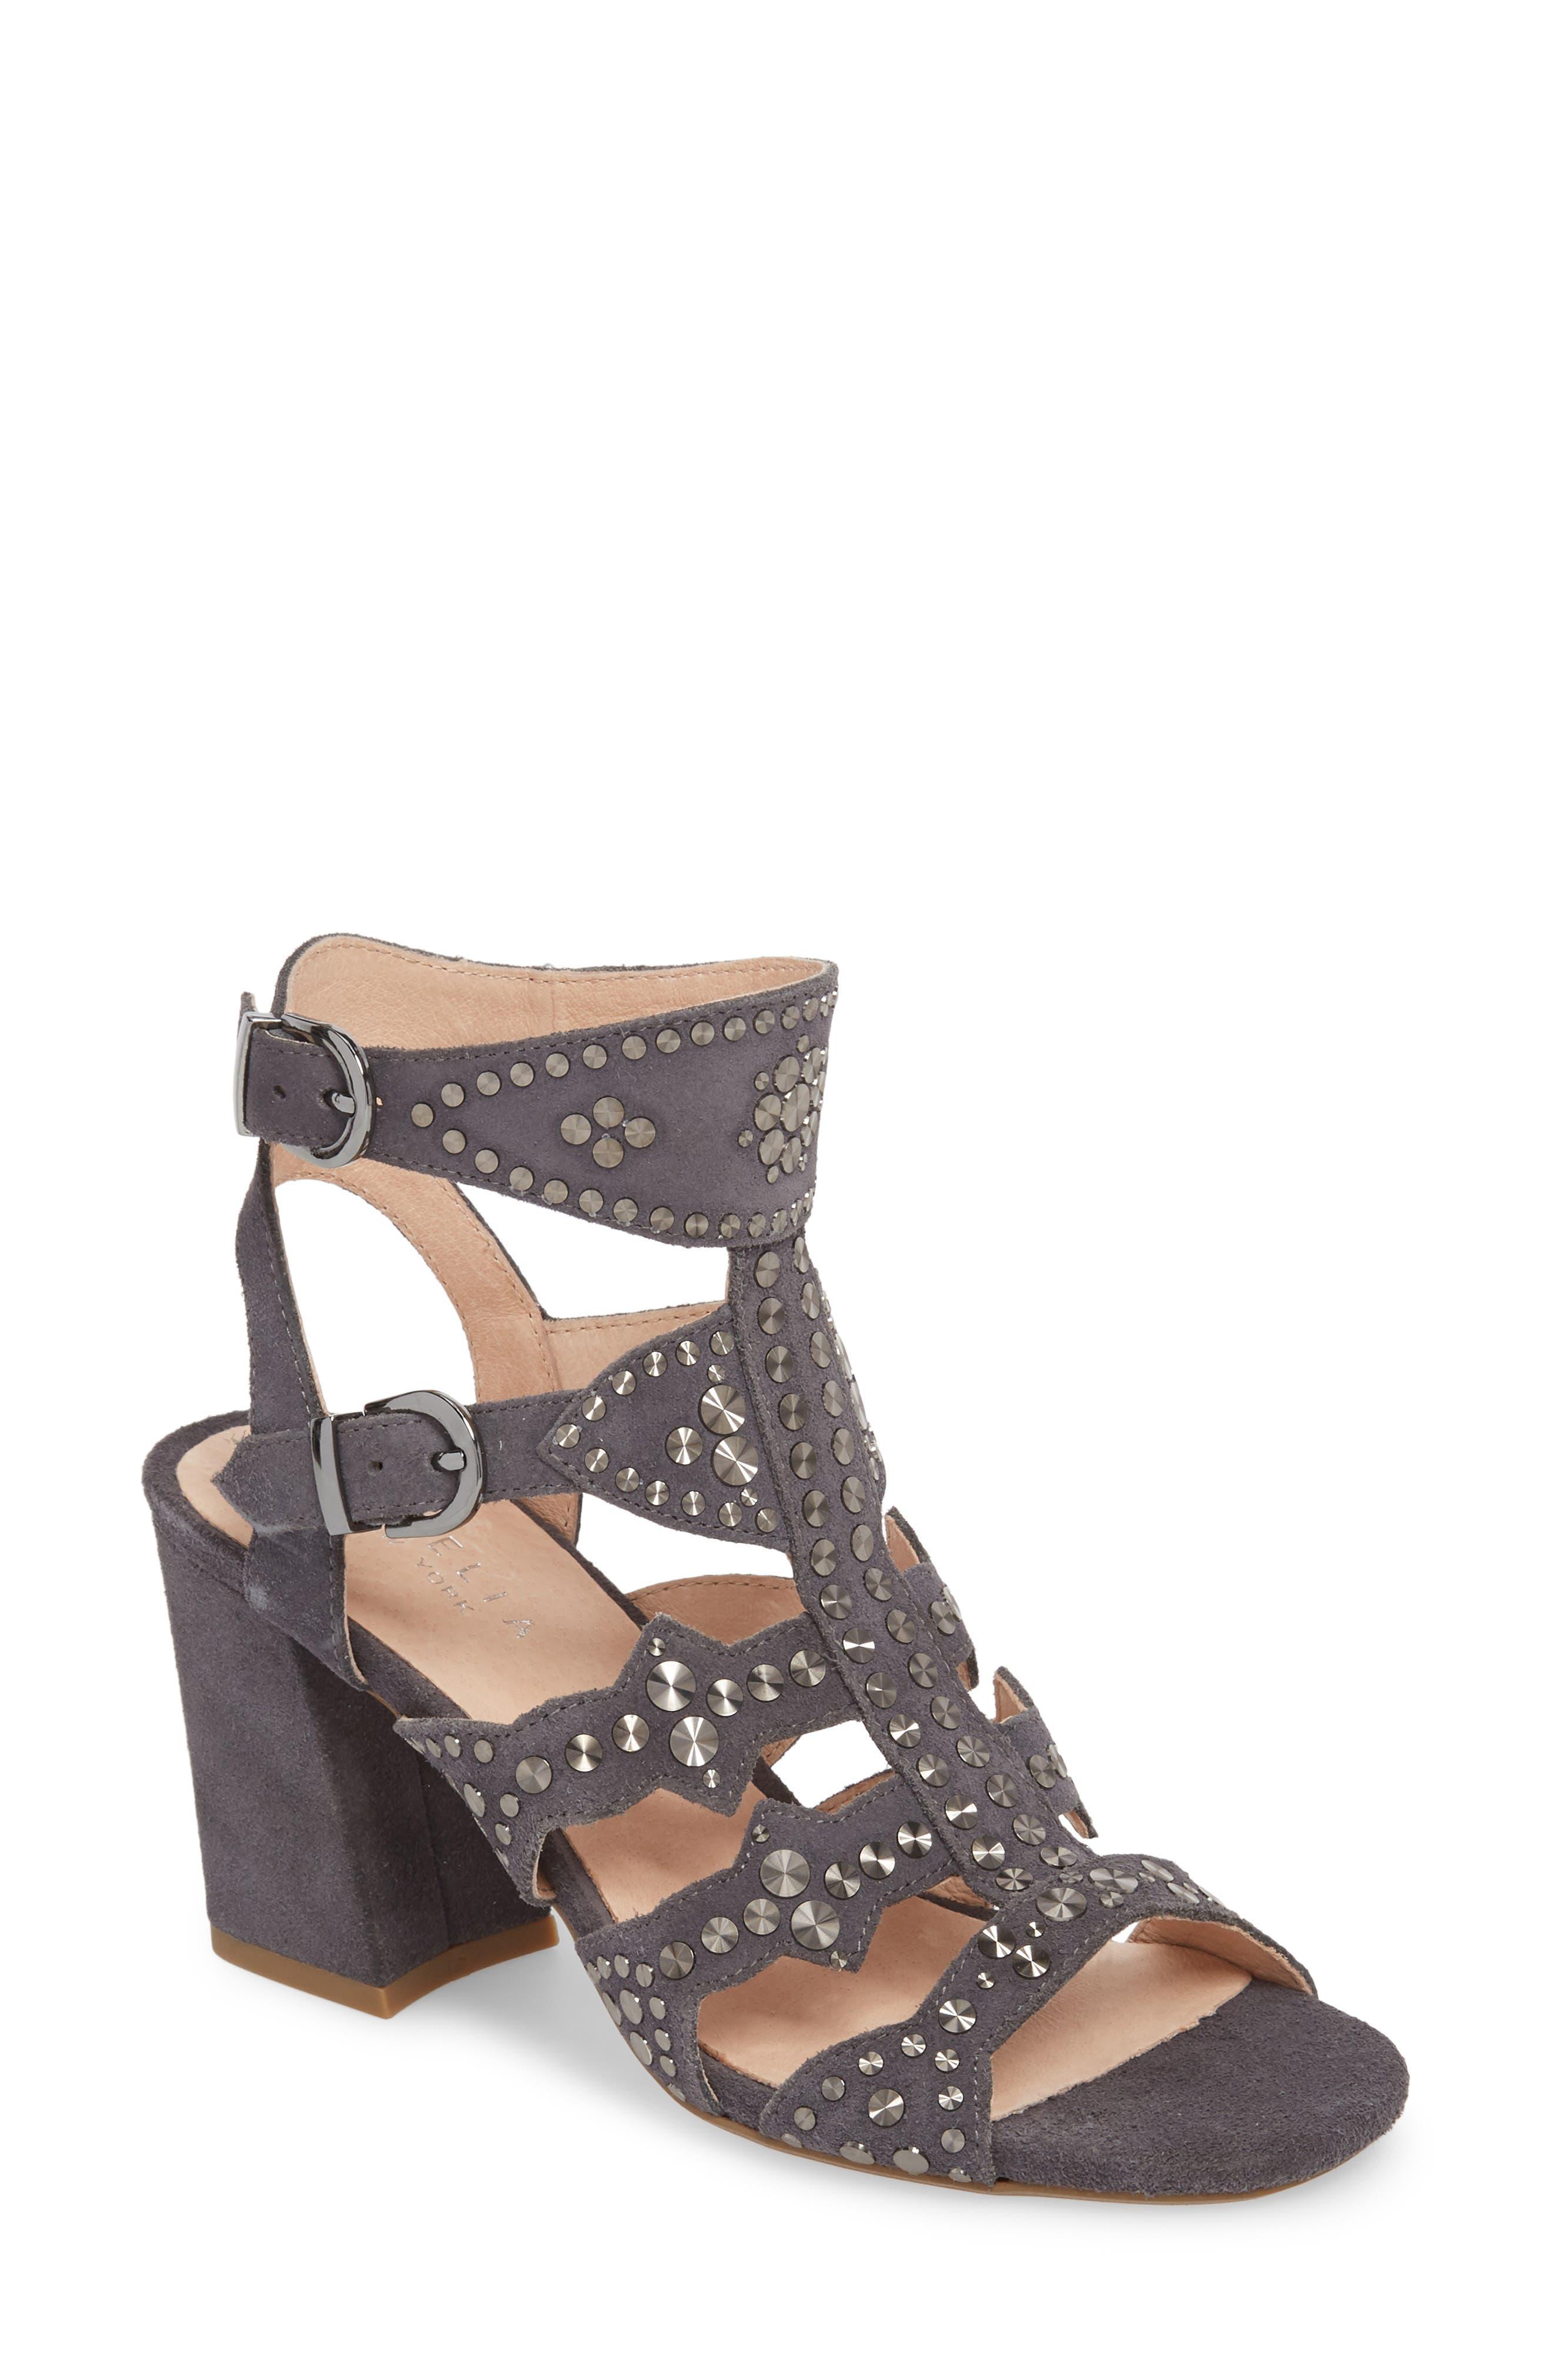 Cecelia New York Cosmo Studded Sandal